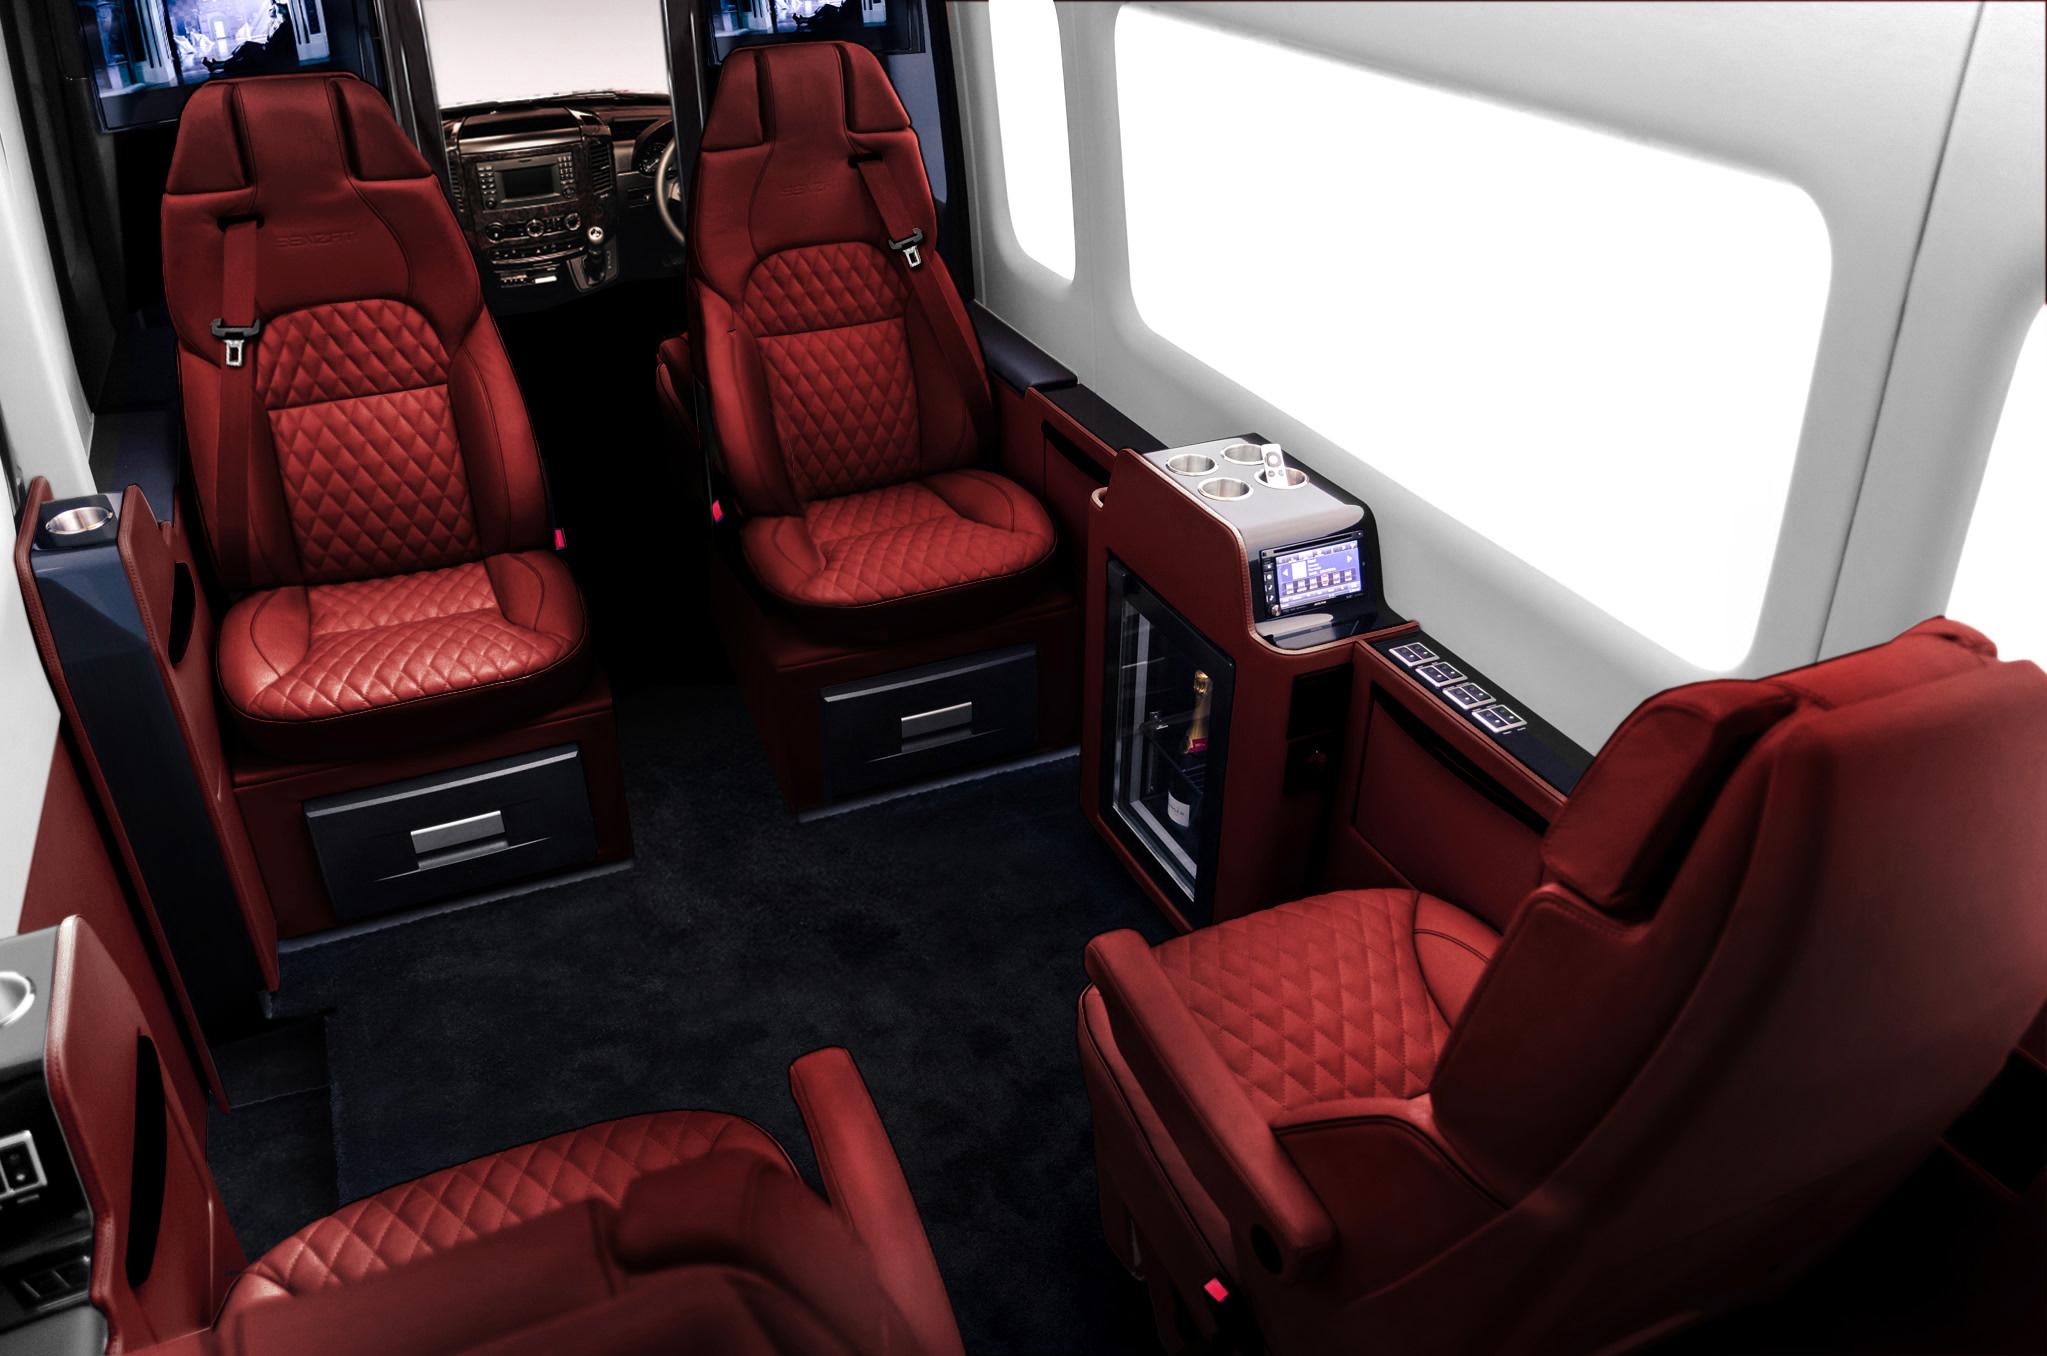 luxury-senzati-jet-sprinter-van-6-690x457